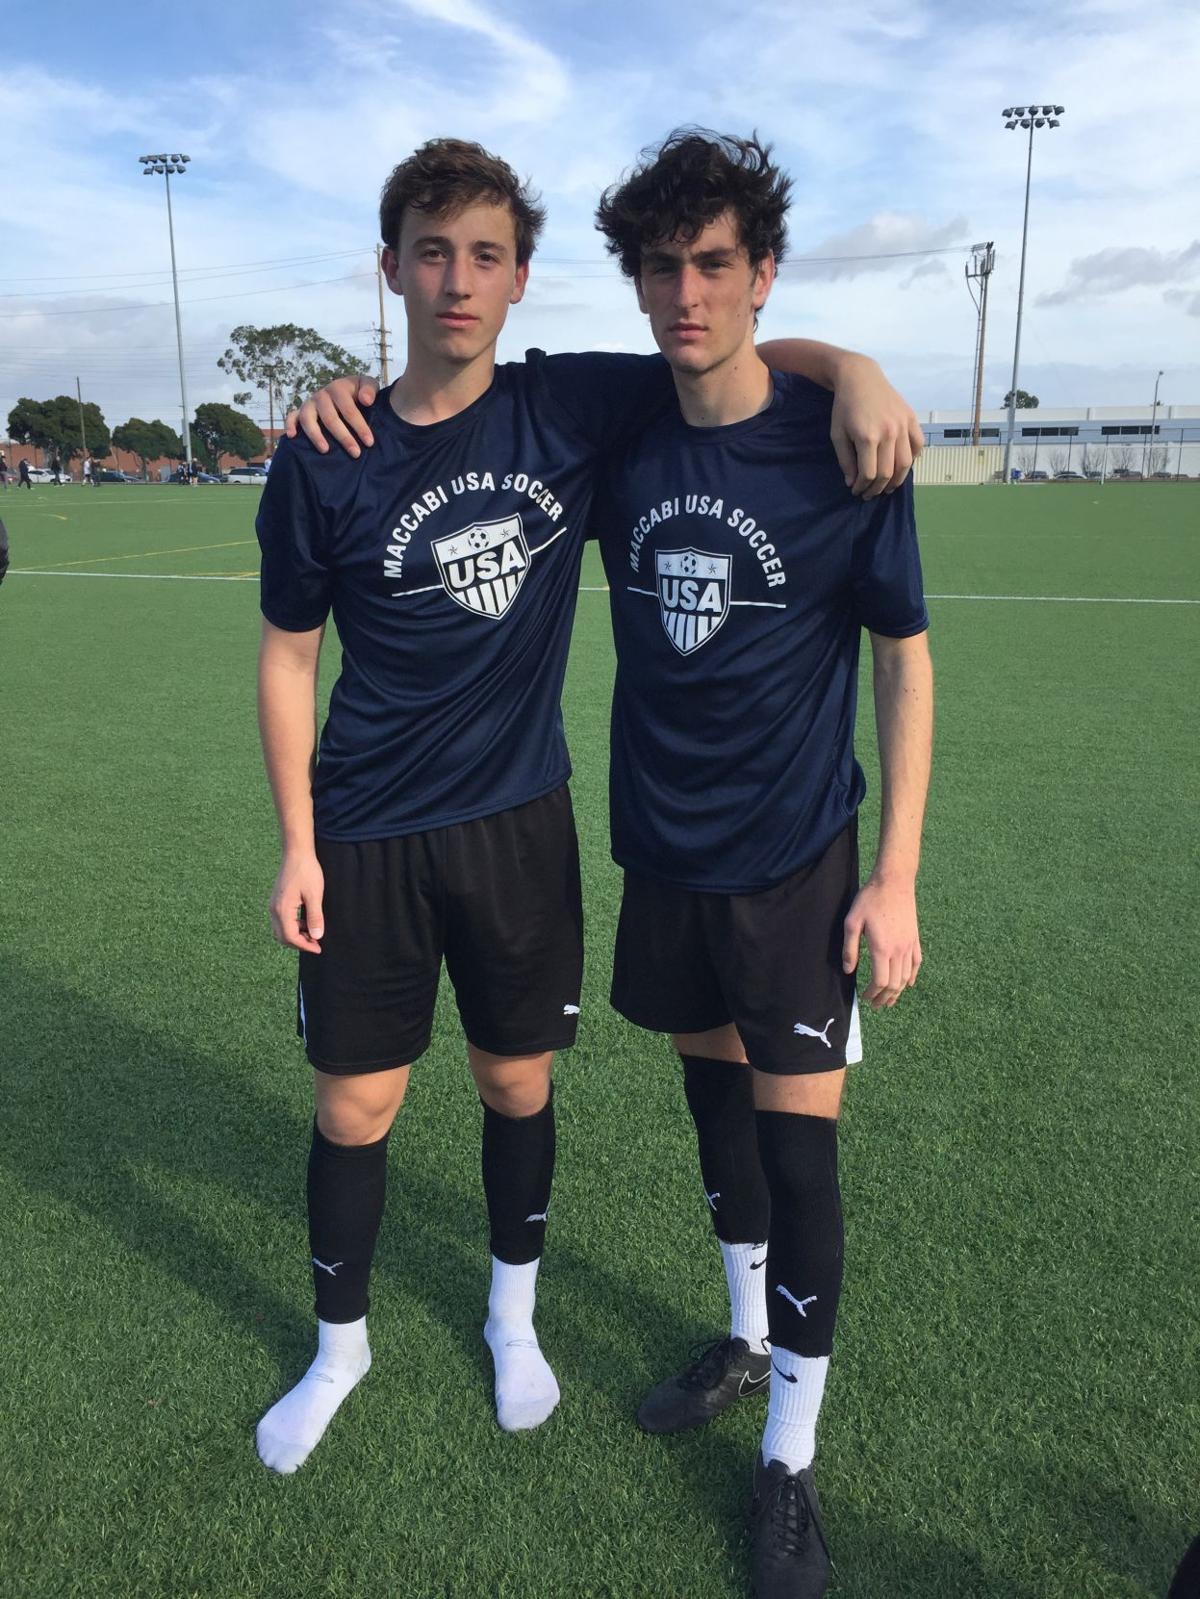 Maccabiah Soccer